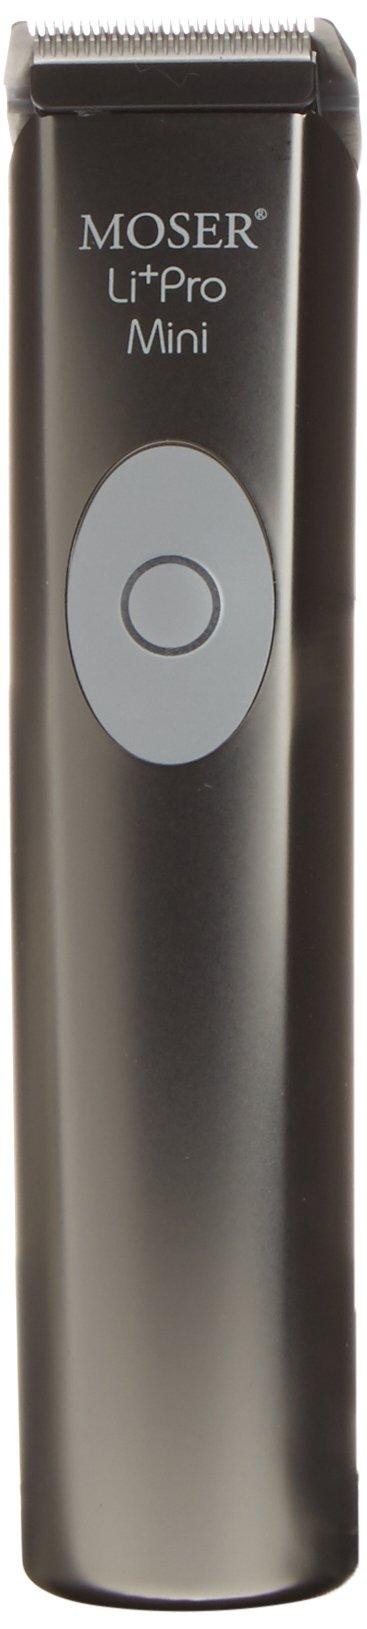 New MOSER 1584 Li+Pro Mini Professional Cordless Hair Trimmer 100-240V